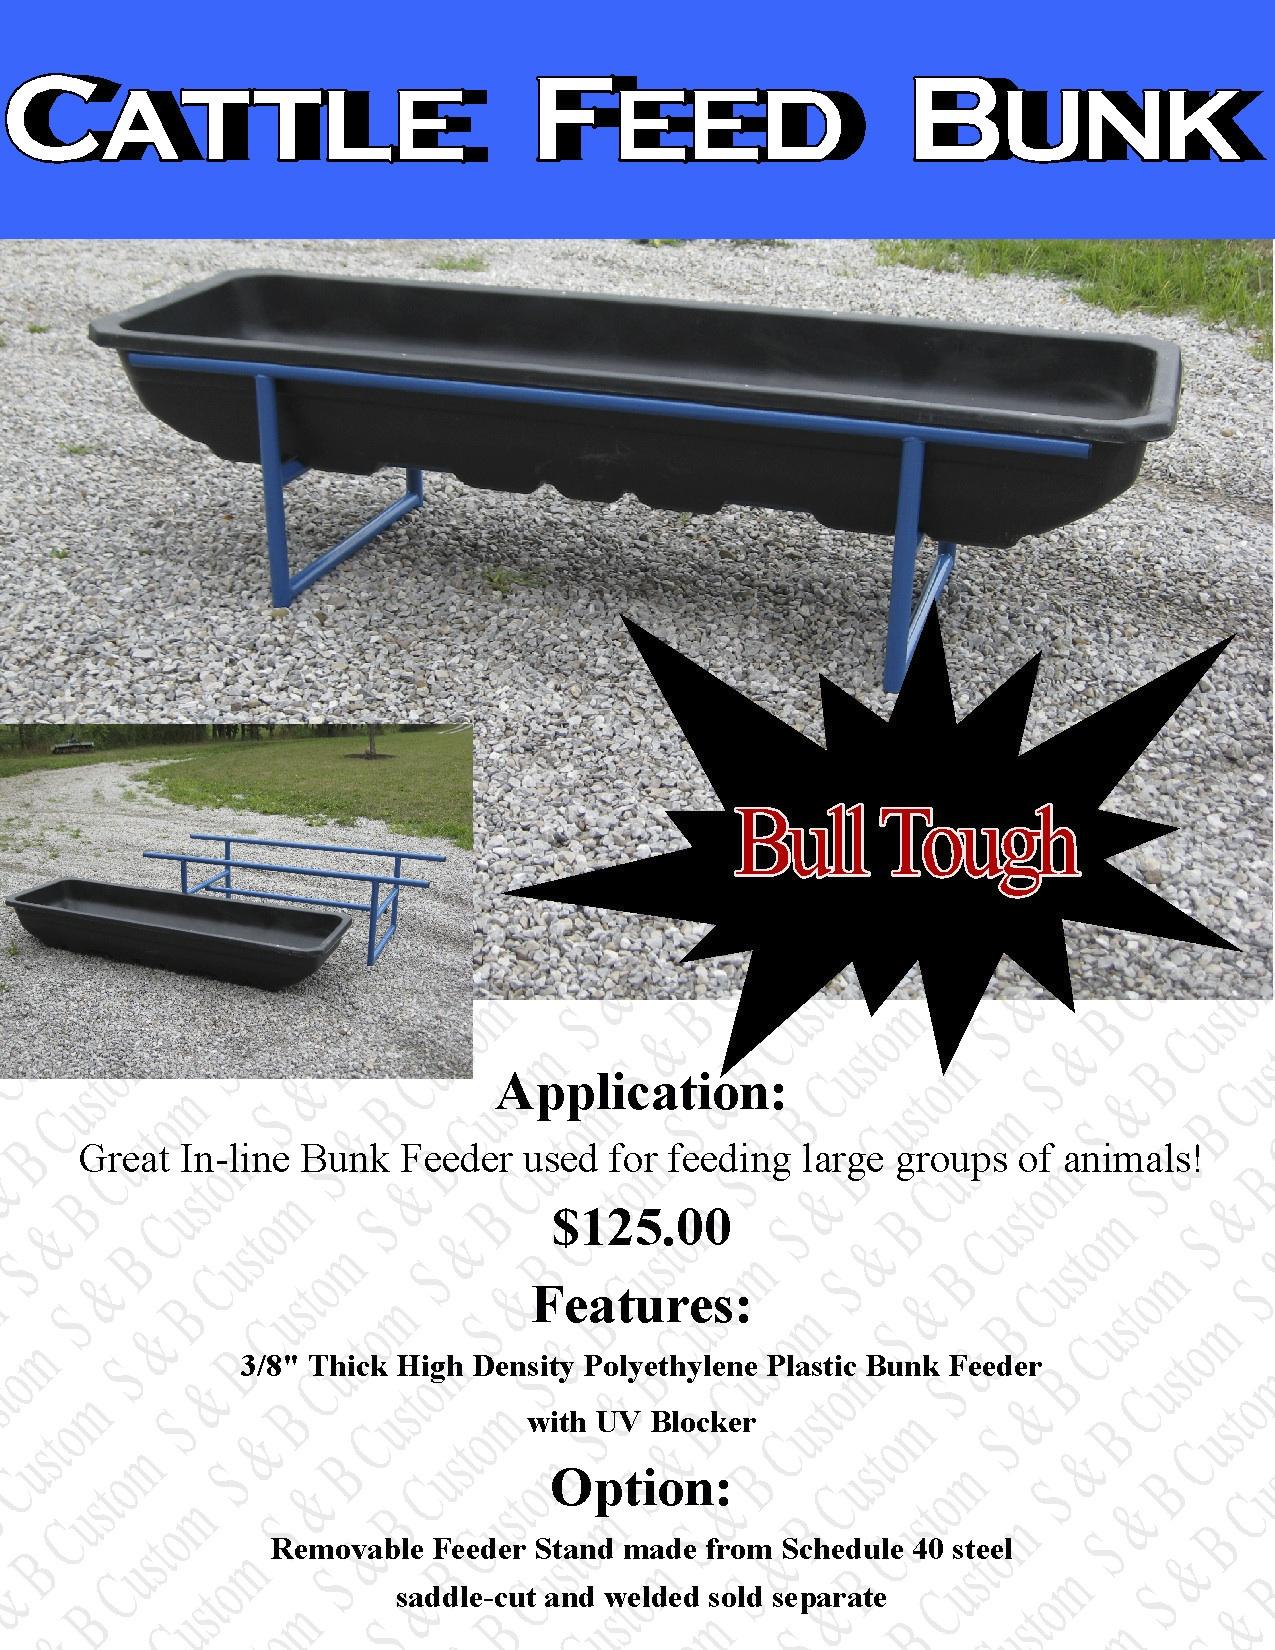 Bull Tough Bunk Feeder Litterature copy